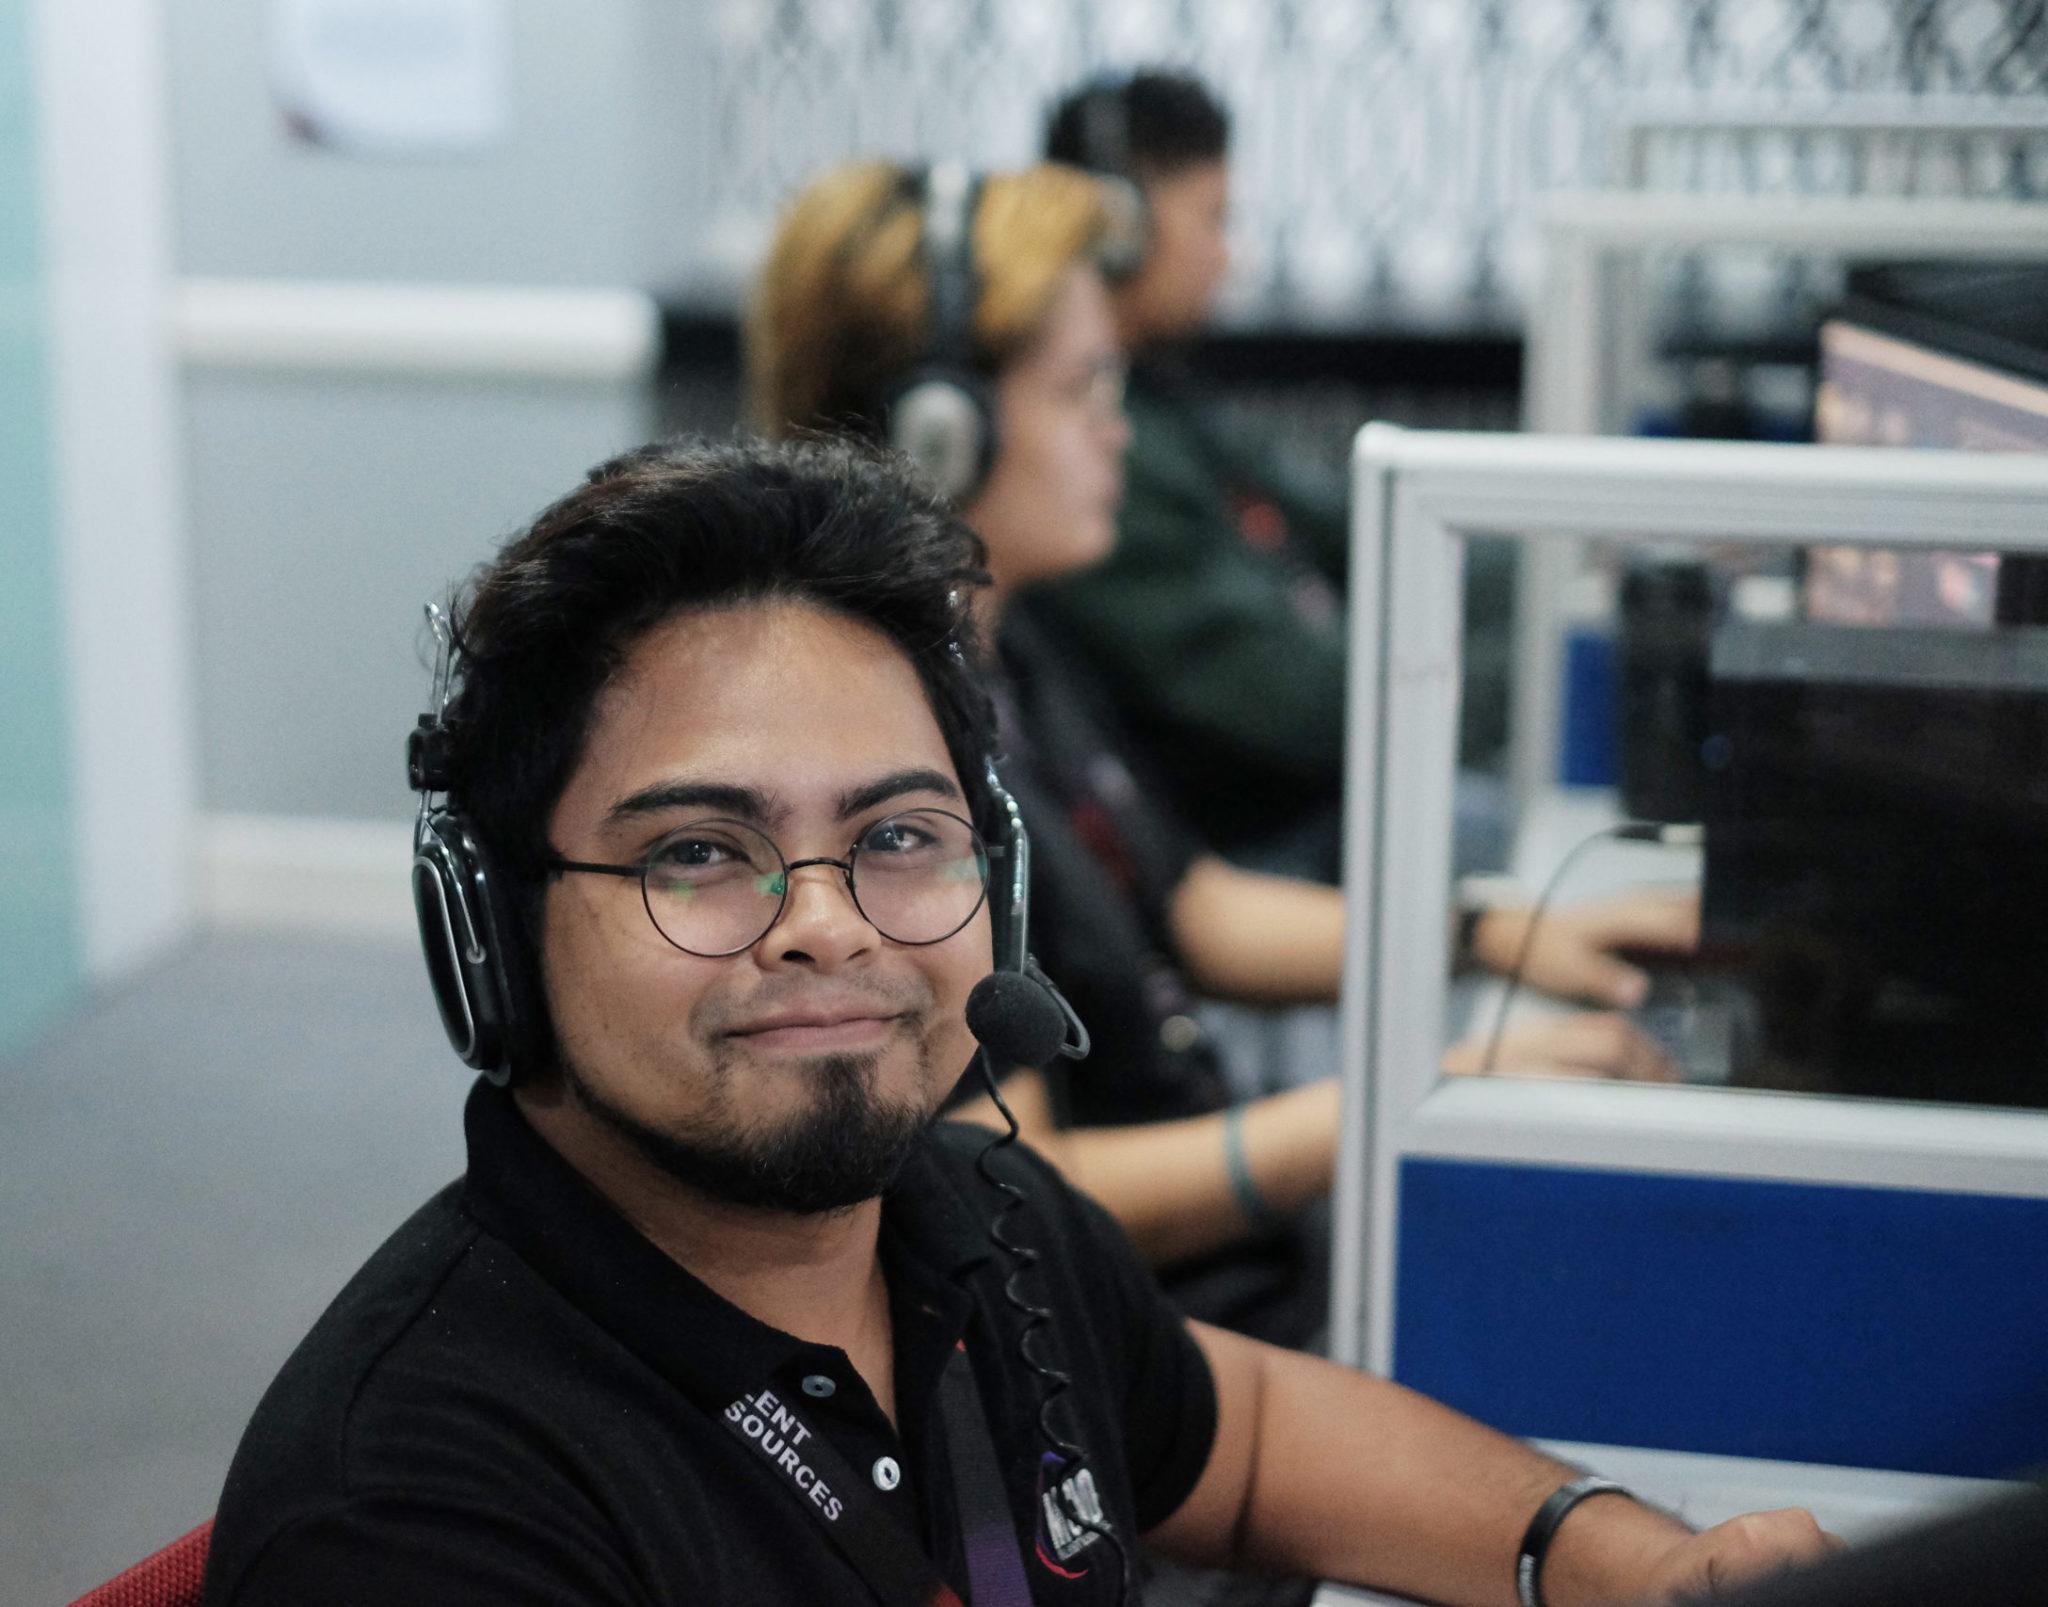 MCVO Customer Service Representative